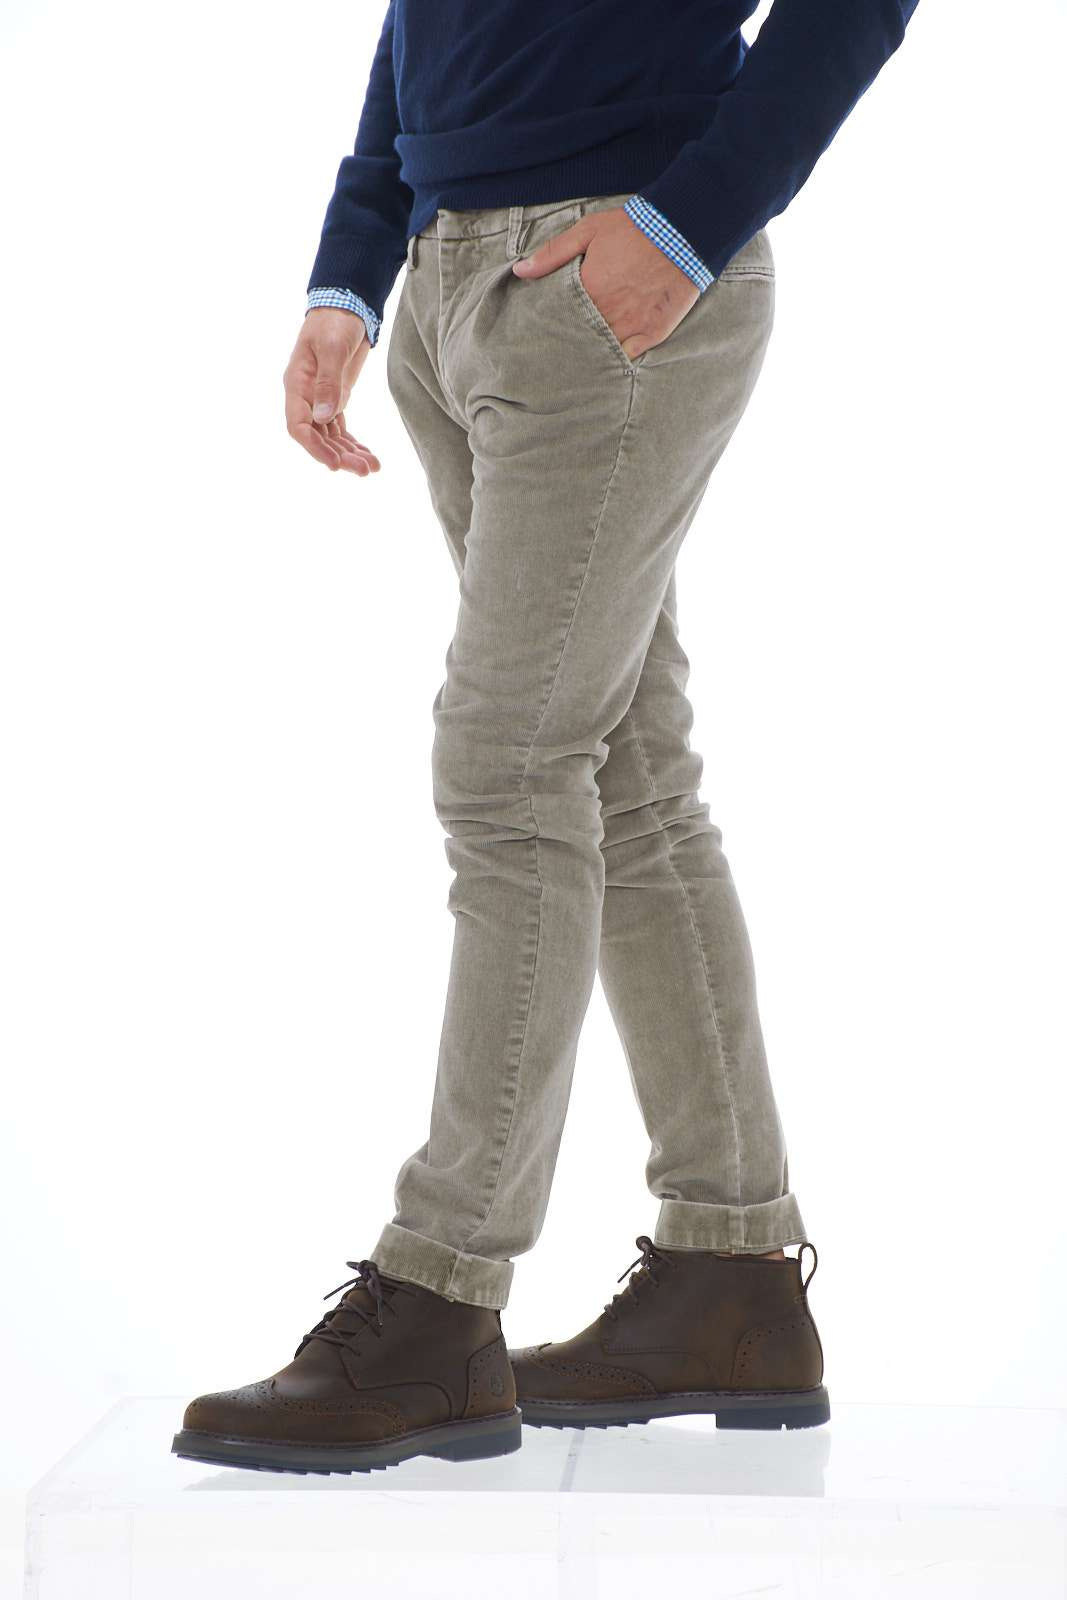 https://www.parmax.com/media/catalog/product/a/i/ai-outlet_parmax-pantaloni-uomo-entre-amis-a1983191001-b.jpg